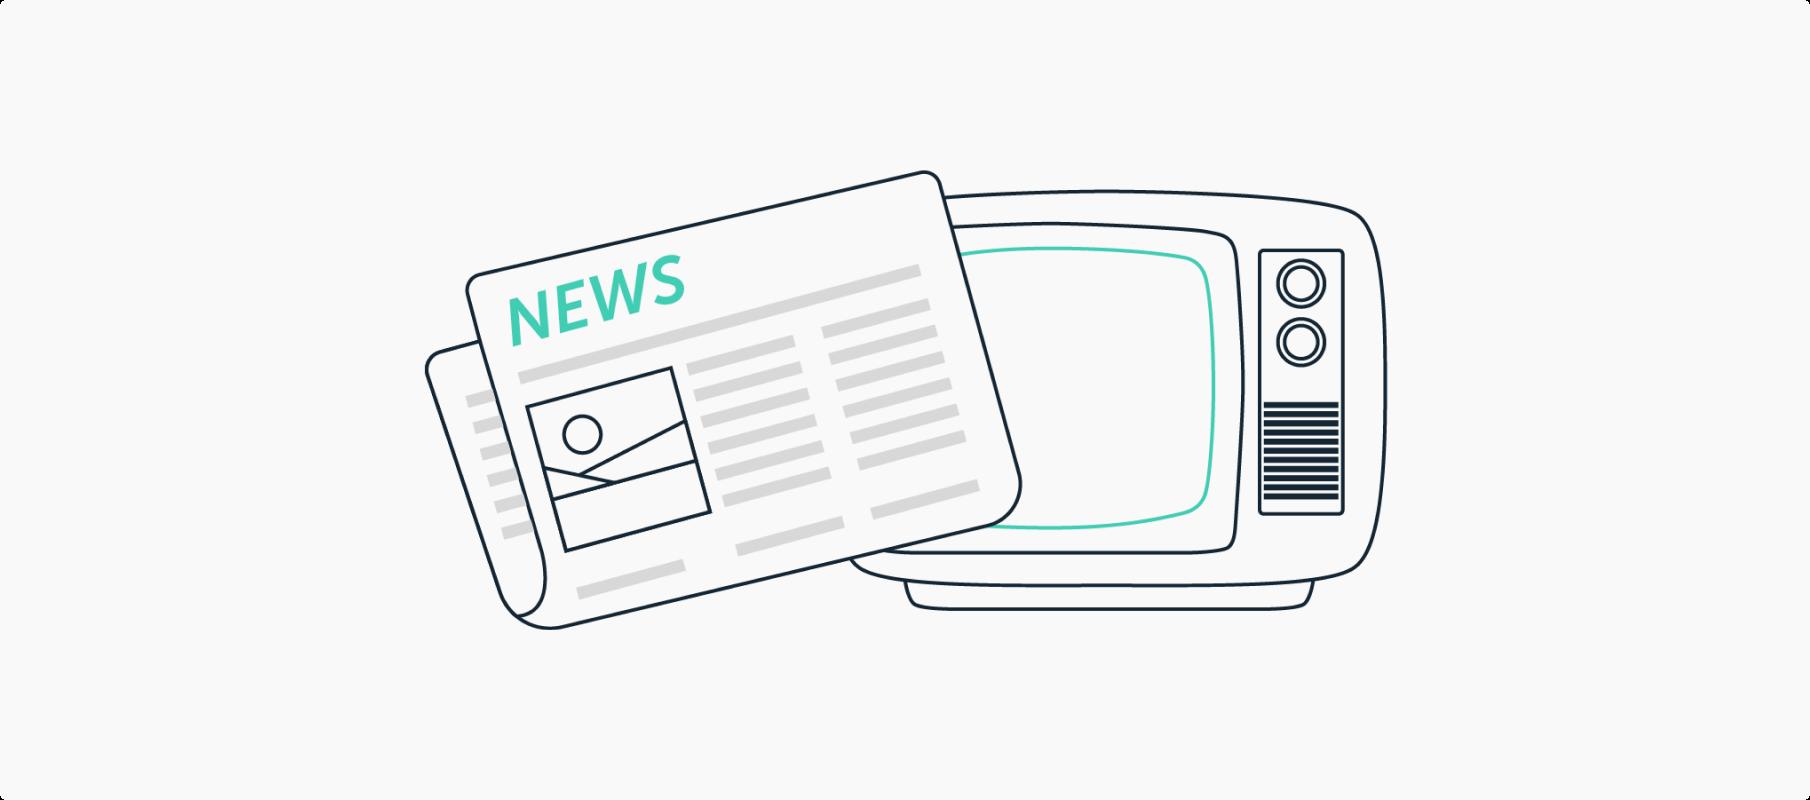 fake news - don't trust, verify